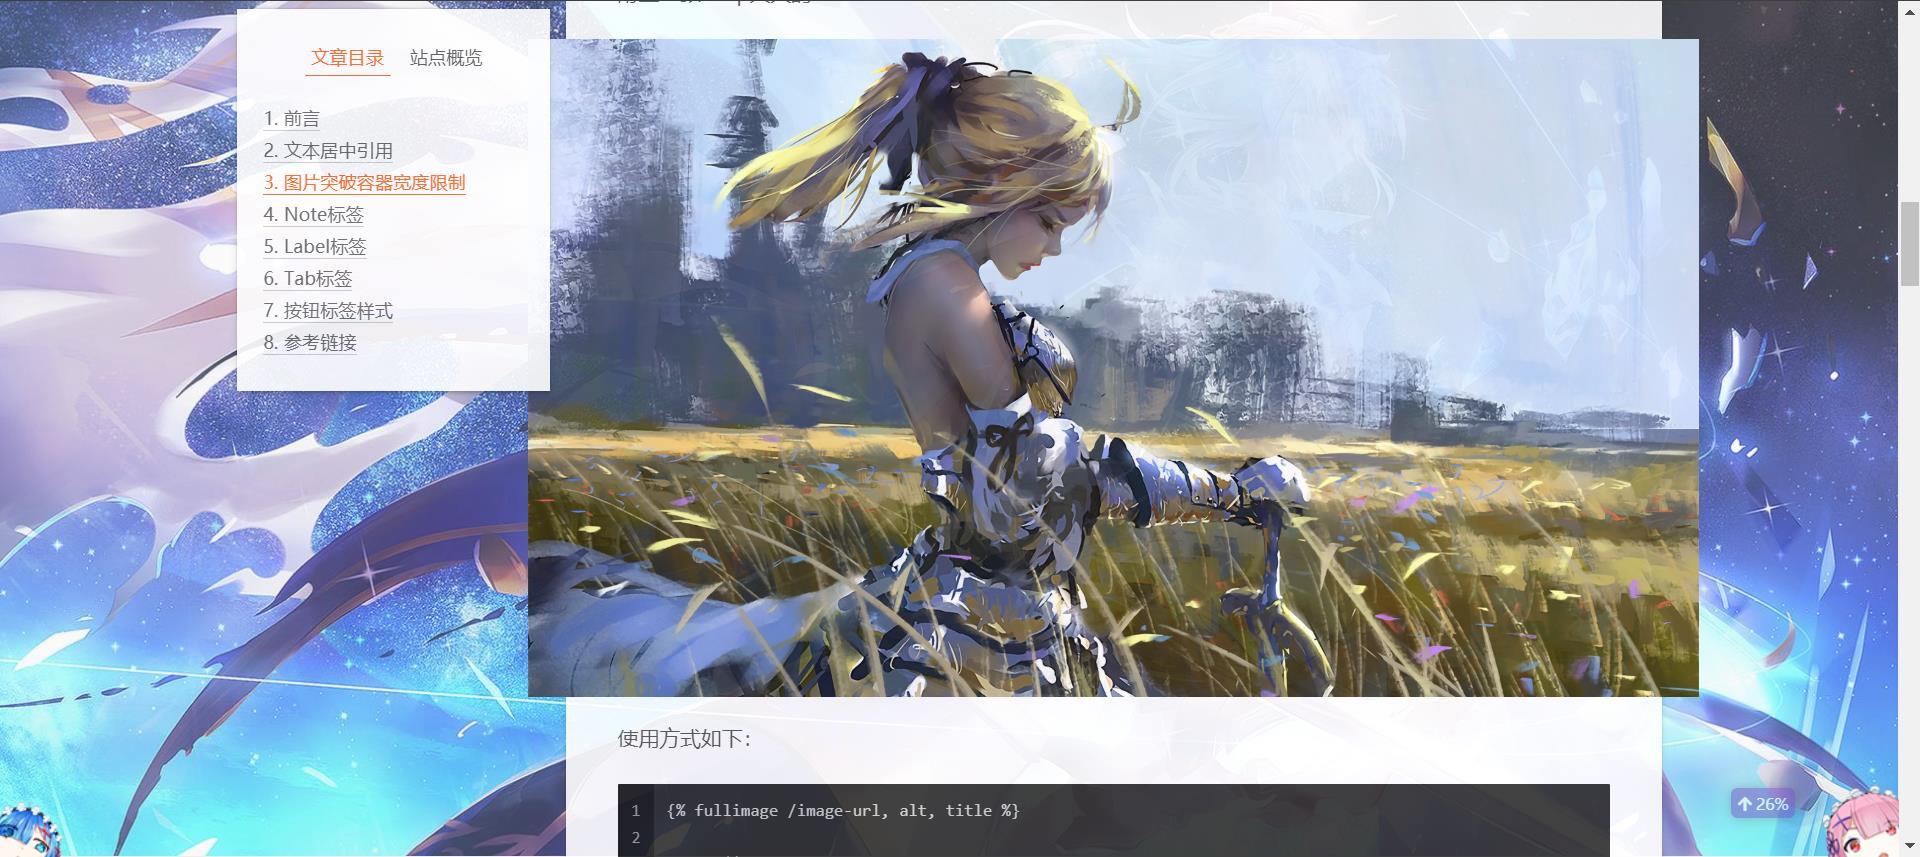 hexo-write-2.jpg